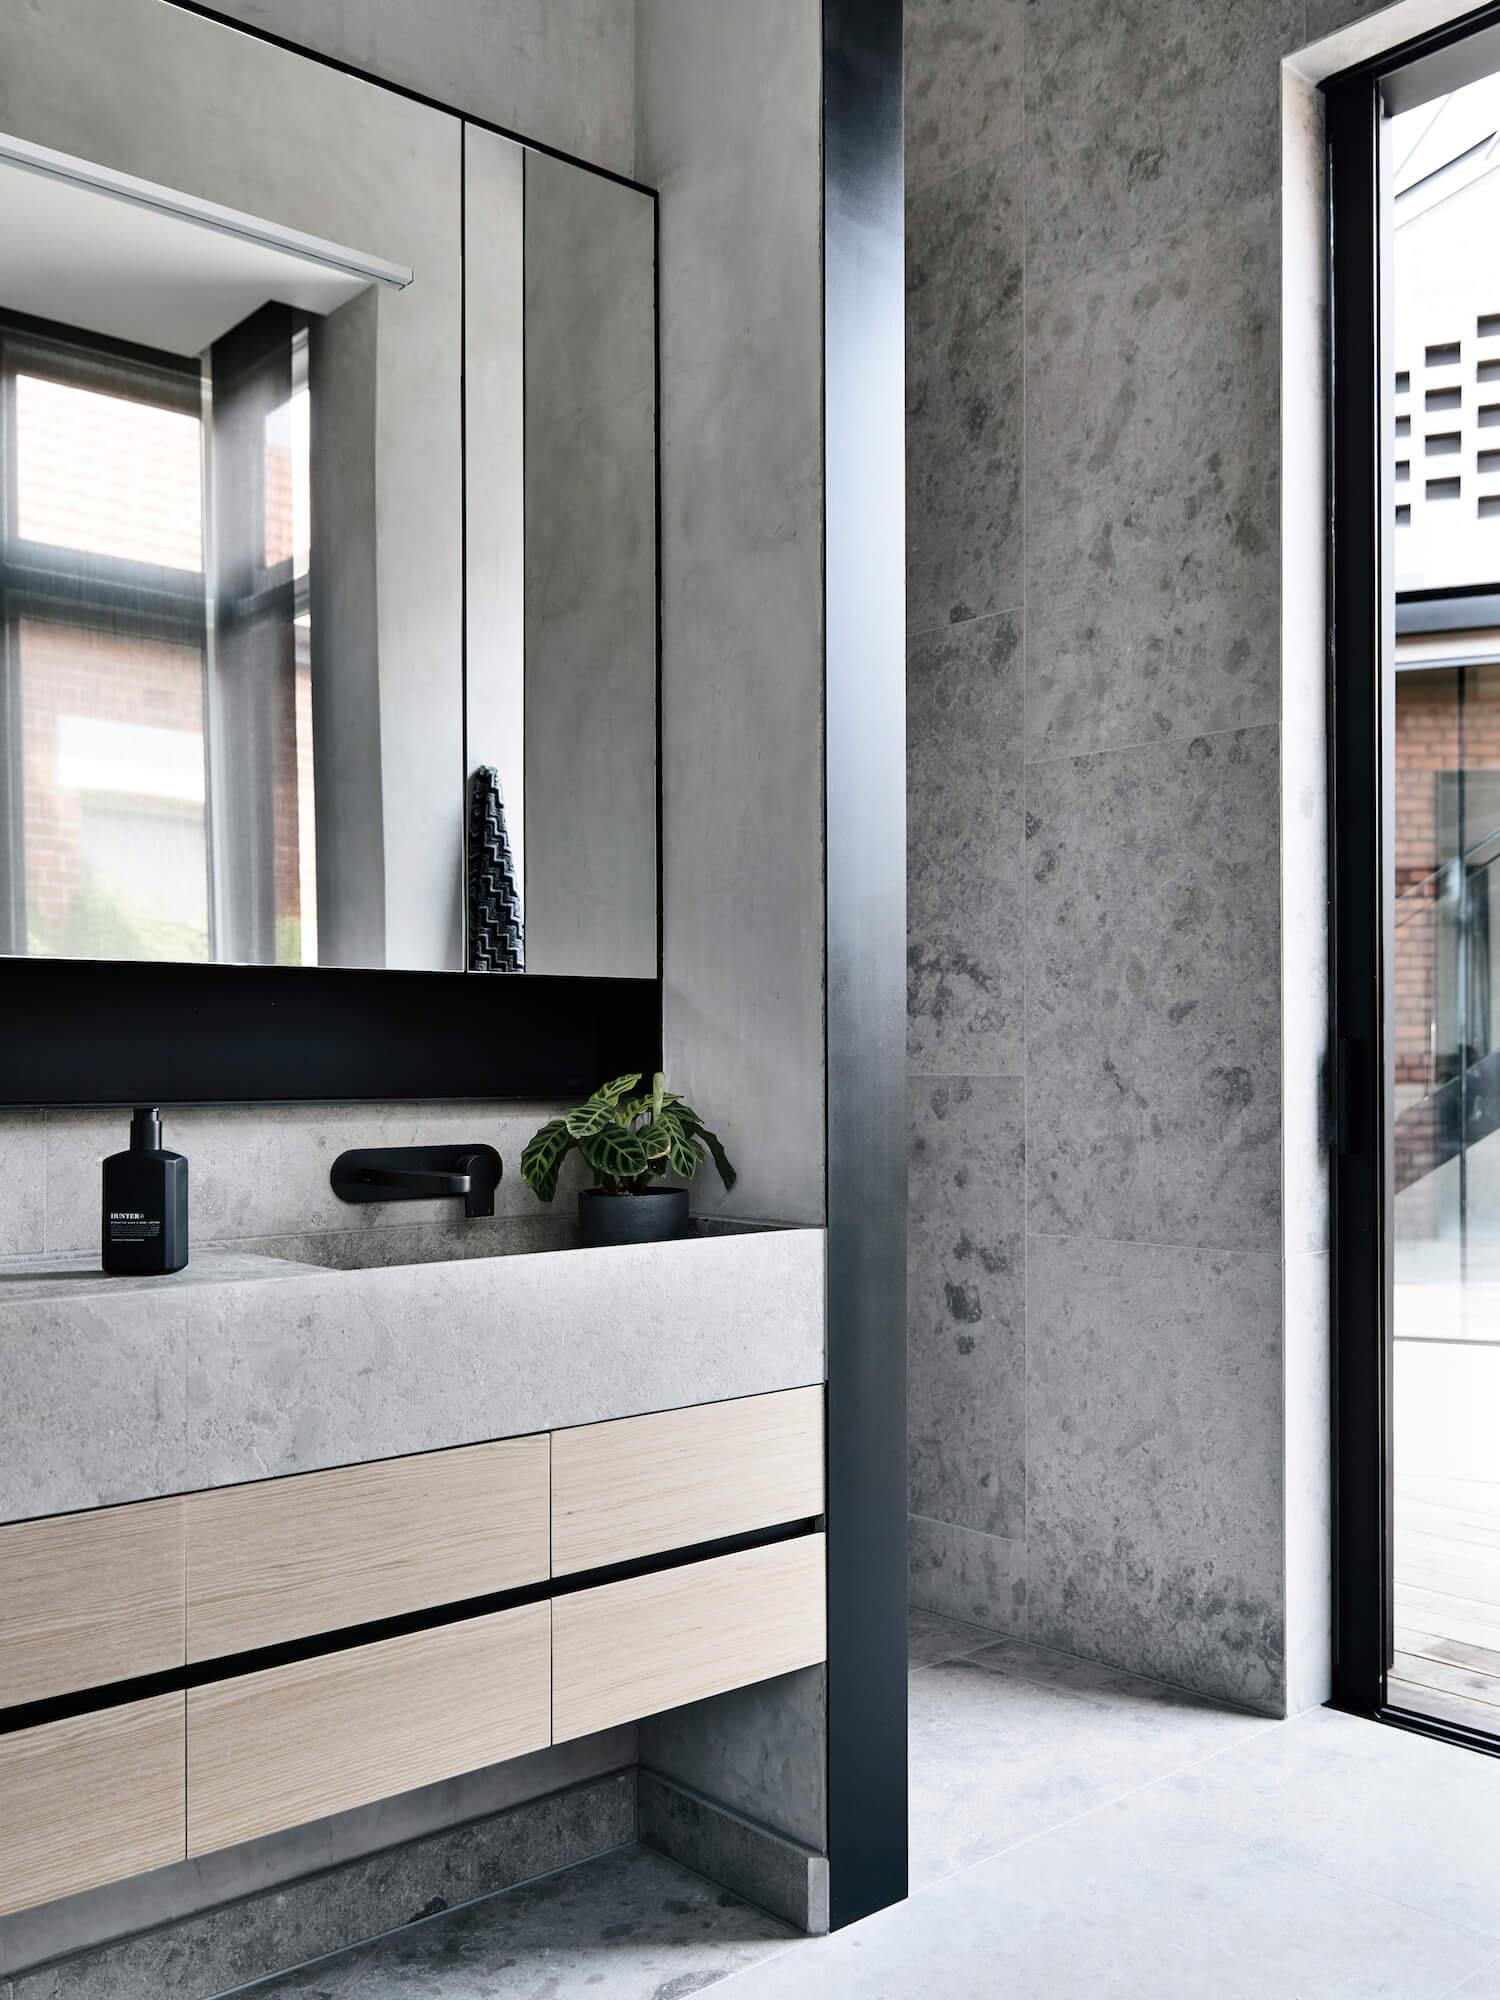 est living york street residence jackson clements burrows architects brickworks 5